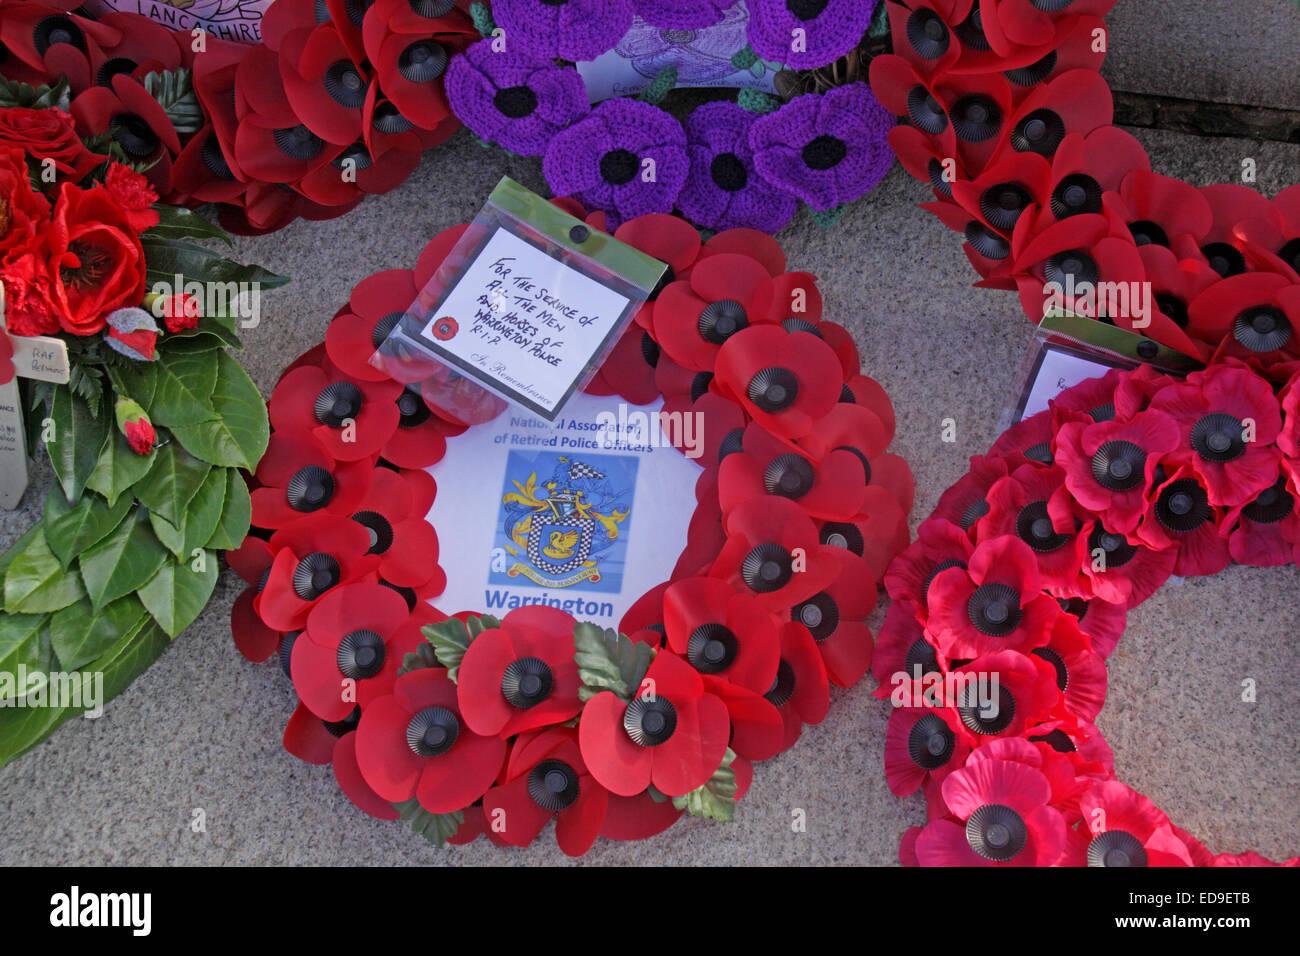 Laden Sie dieses Alamy Stockfoto Gedenktag & Mohn Kränze Warrington Kenotaph Nov 2014, Bridgefoot, Wilderspool Causeway, Cheshire, England, UK - ED9ETB